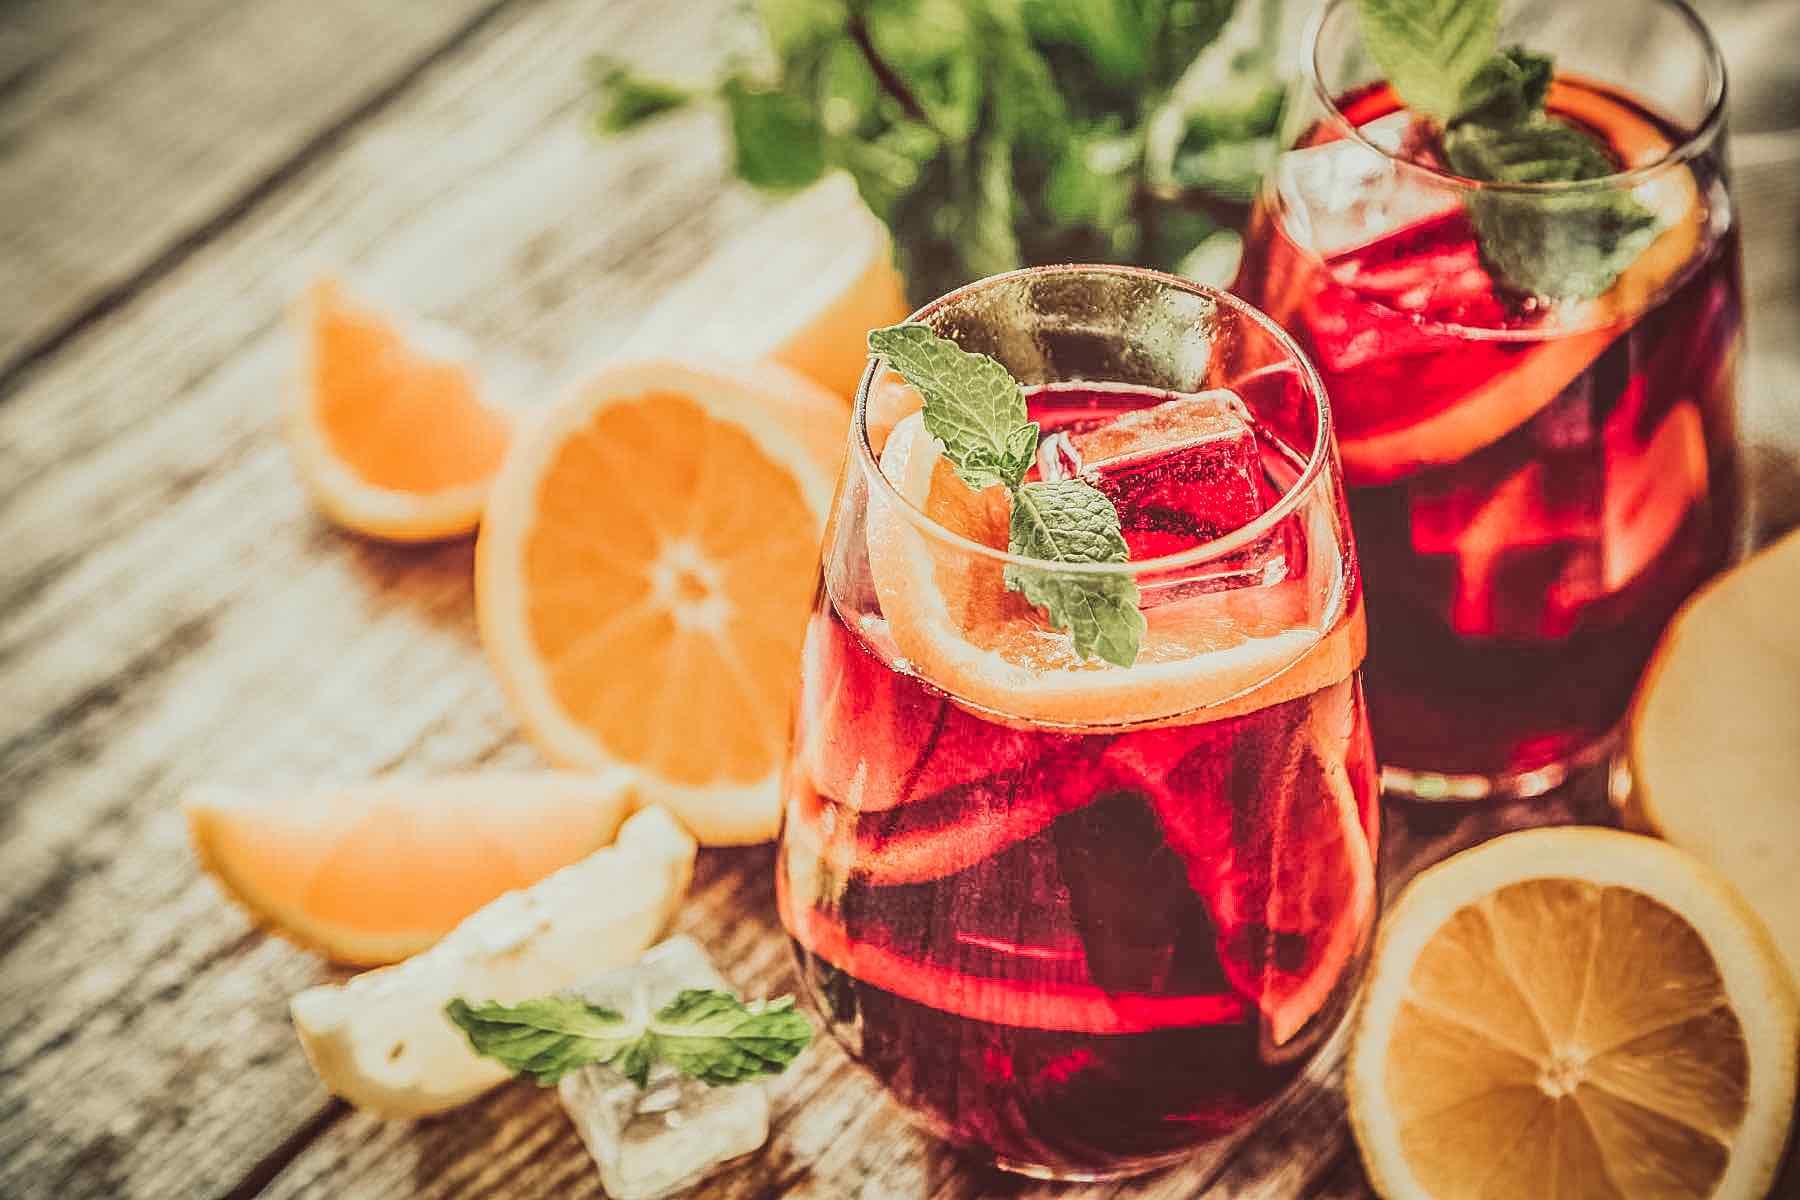 Sangria And Ingredients In Glasses – ©Adobe